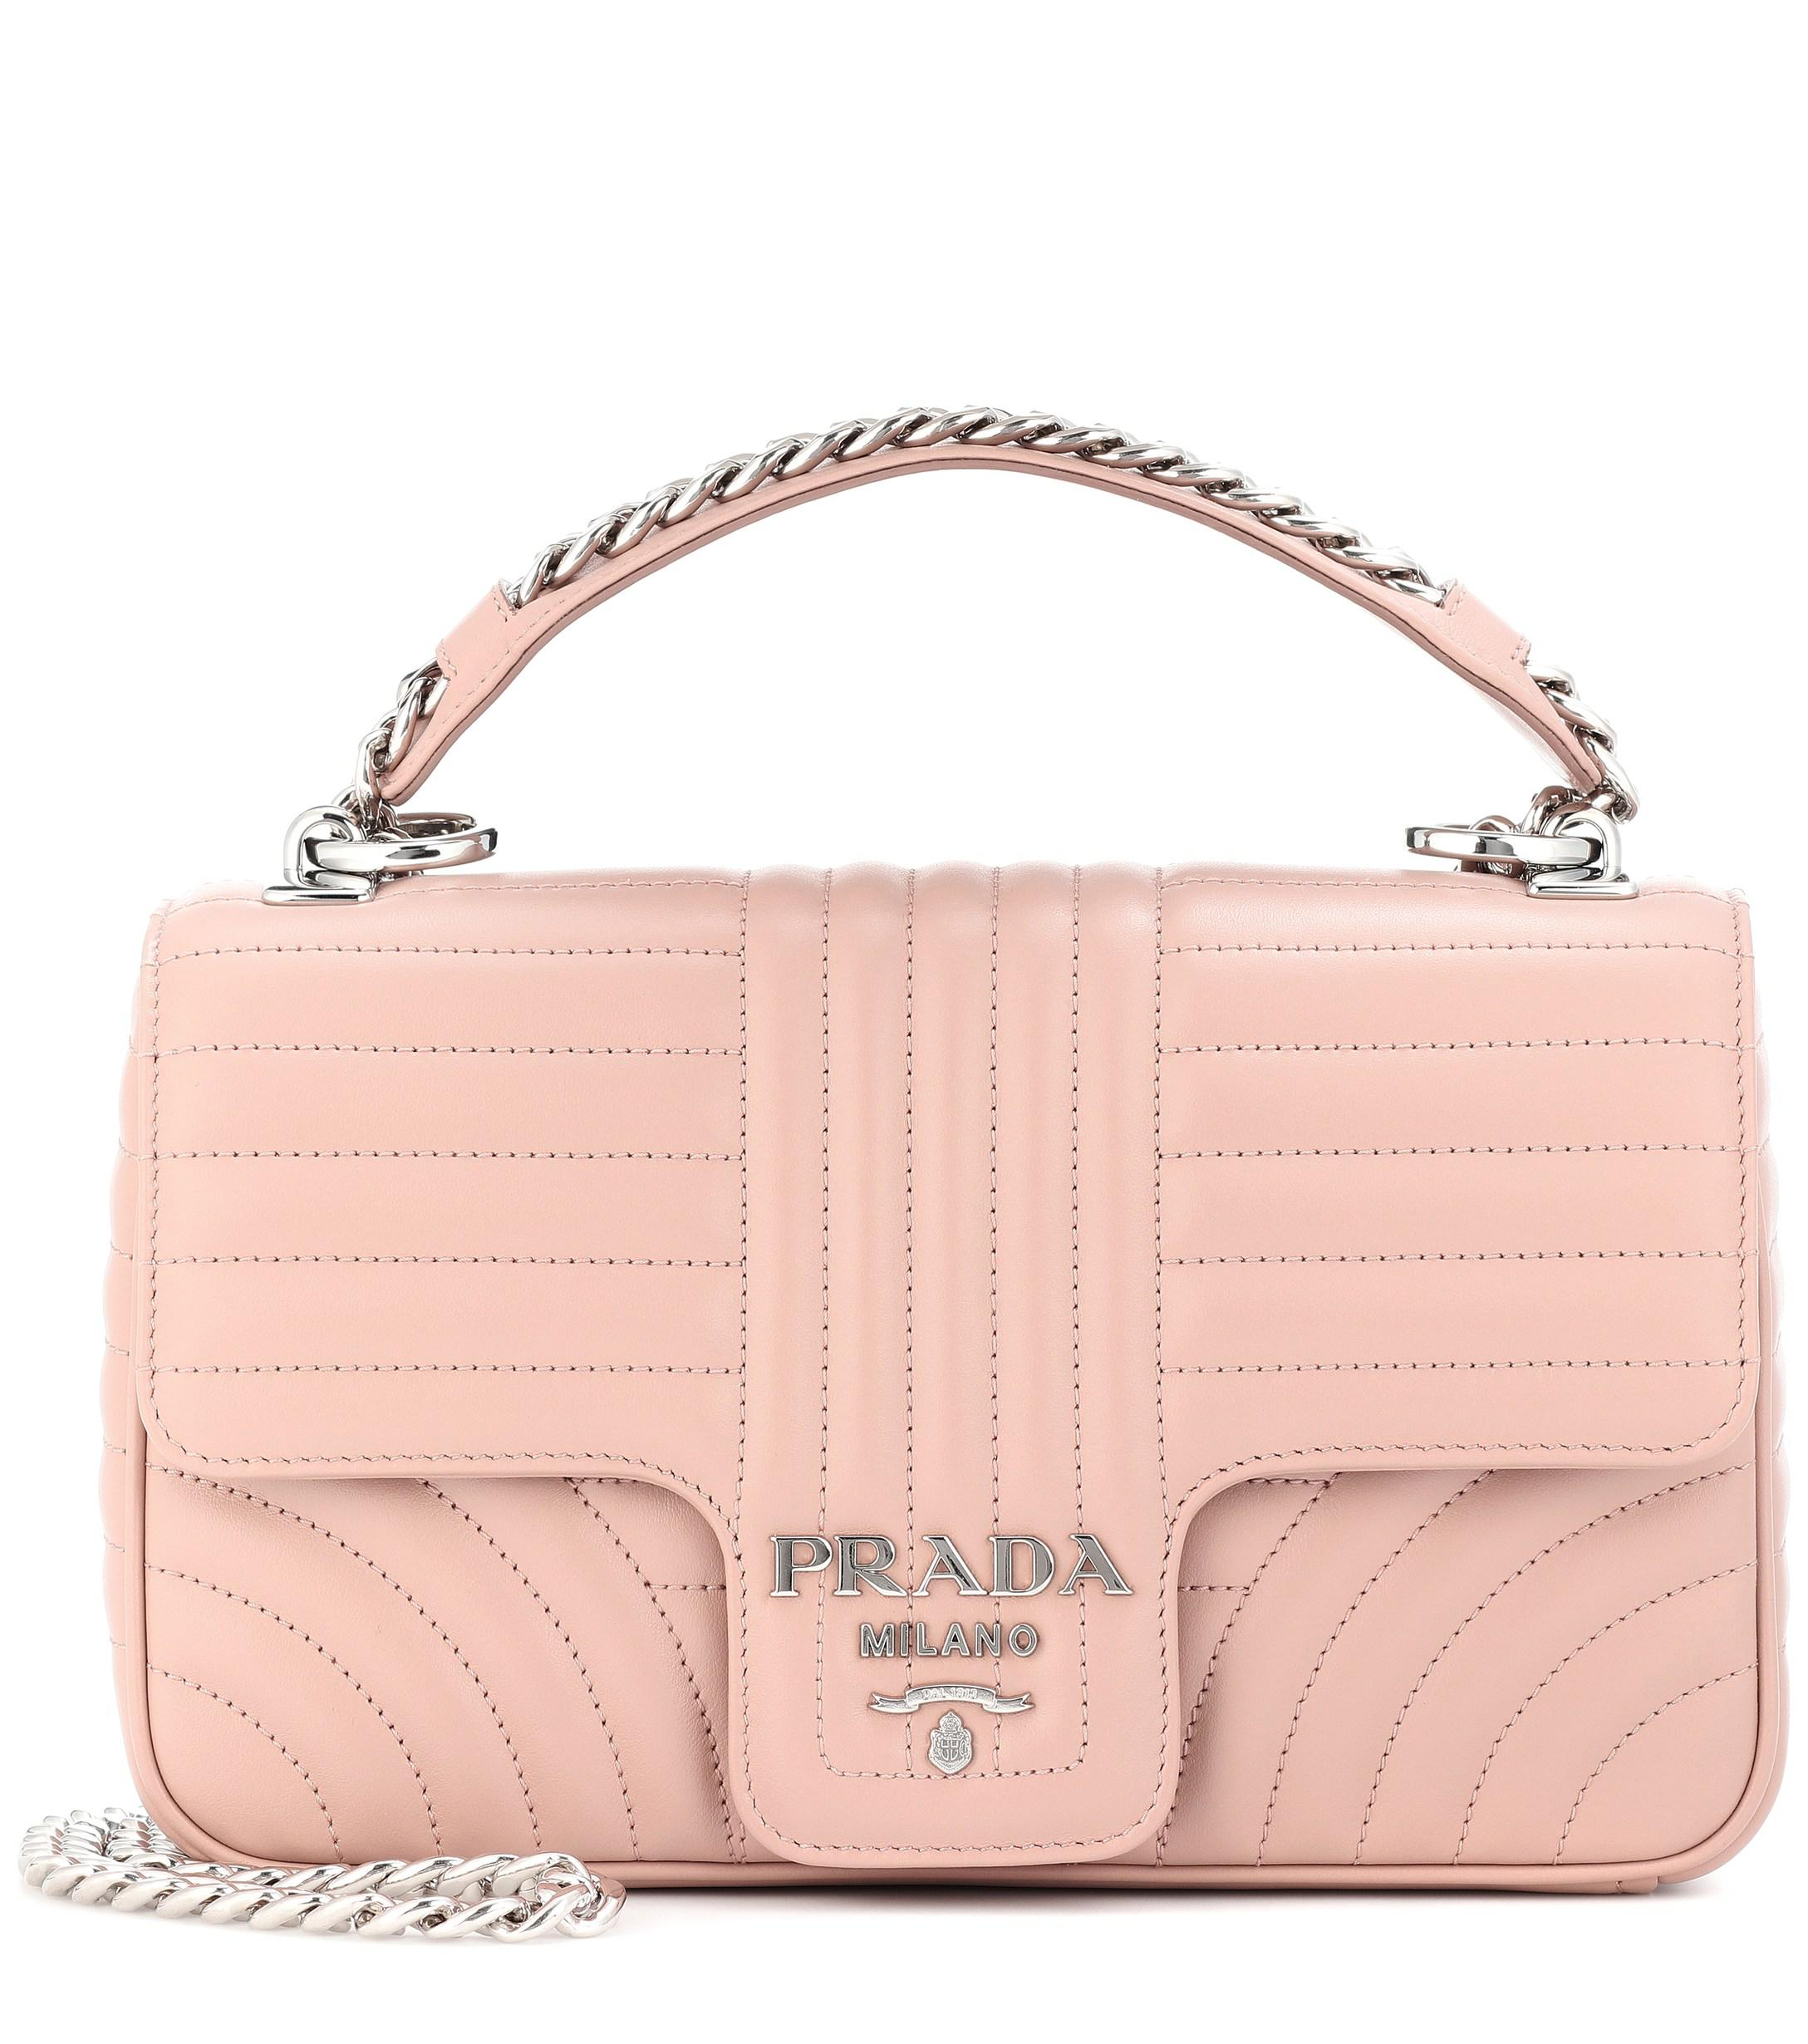 95f93e2730eb Prada Diagramme Medium Leather Shoulder Bag in Pink - Lyst